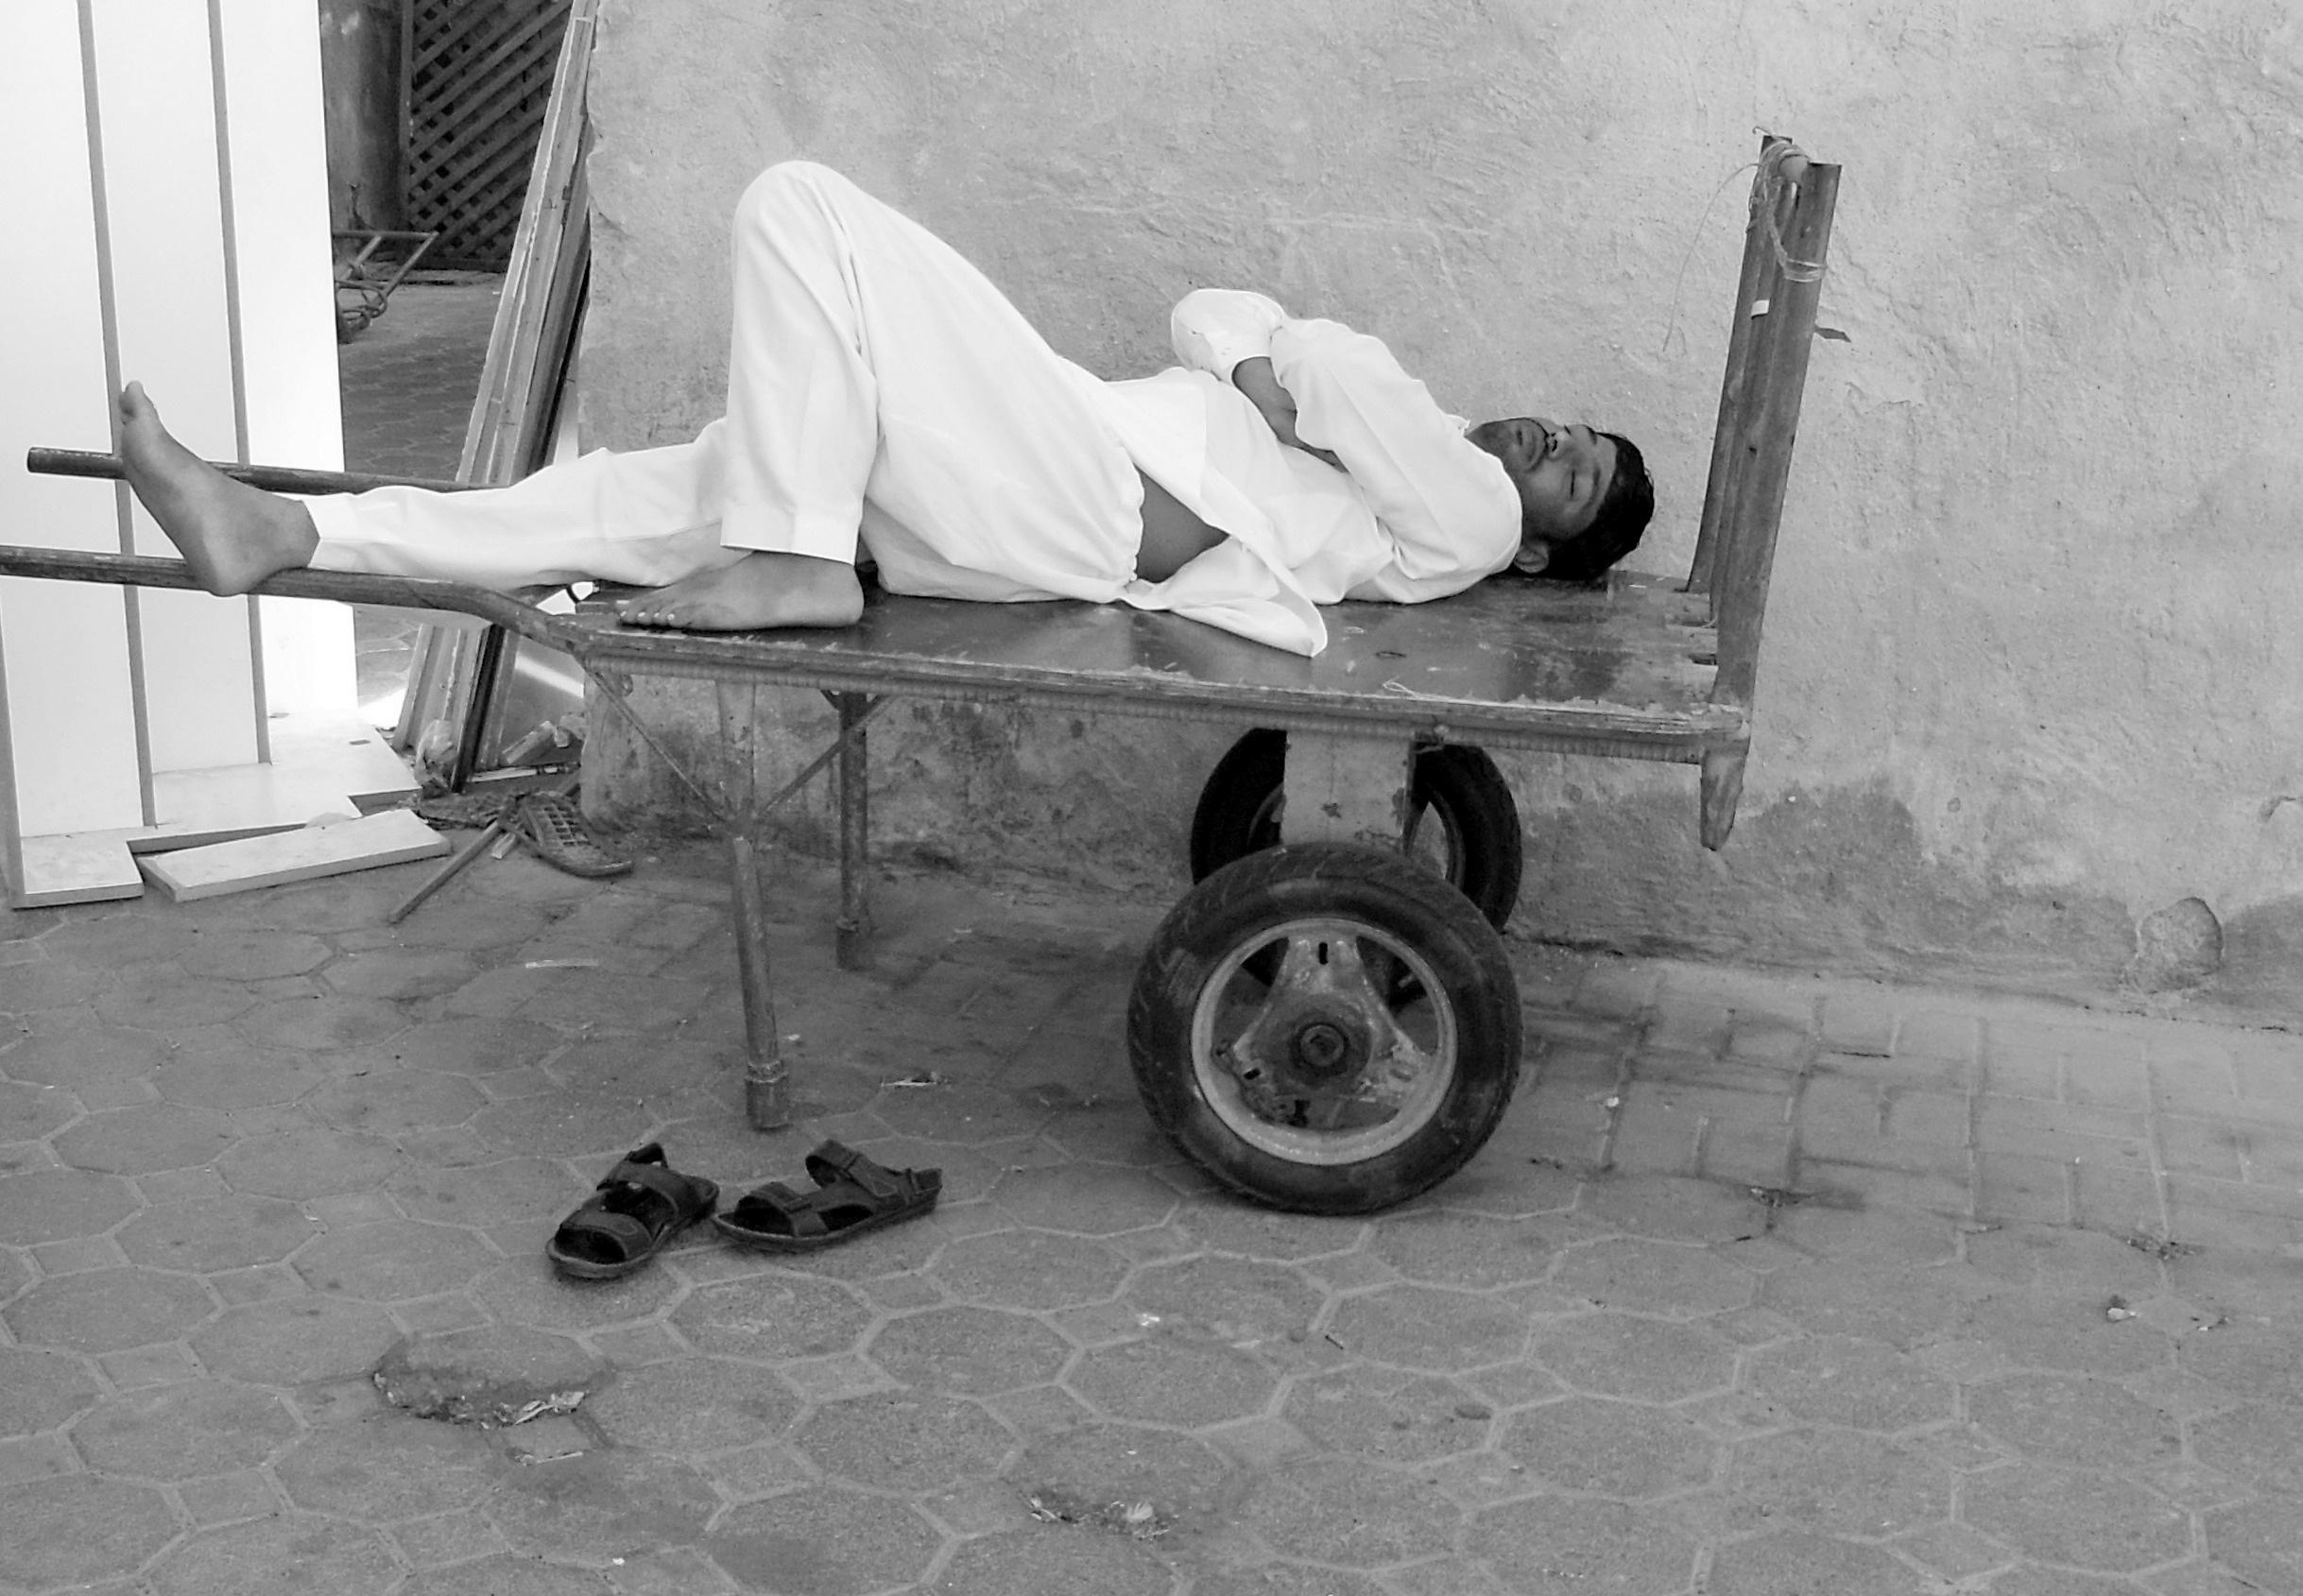 Free man black and white chair sitting dubai rest